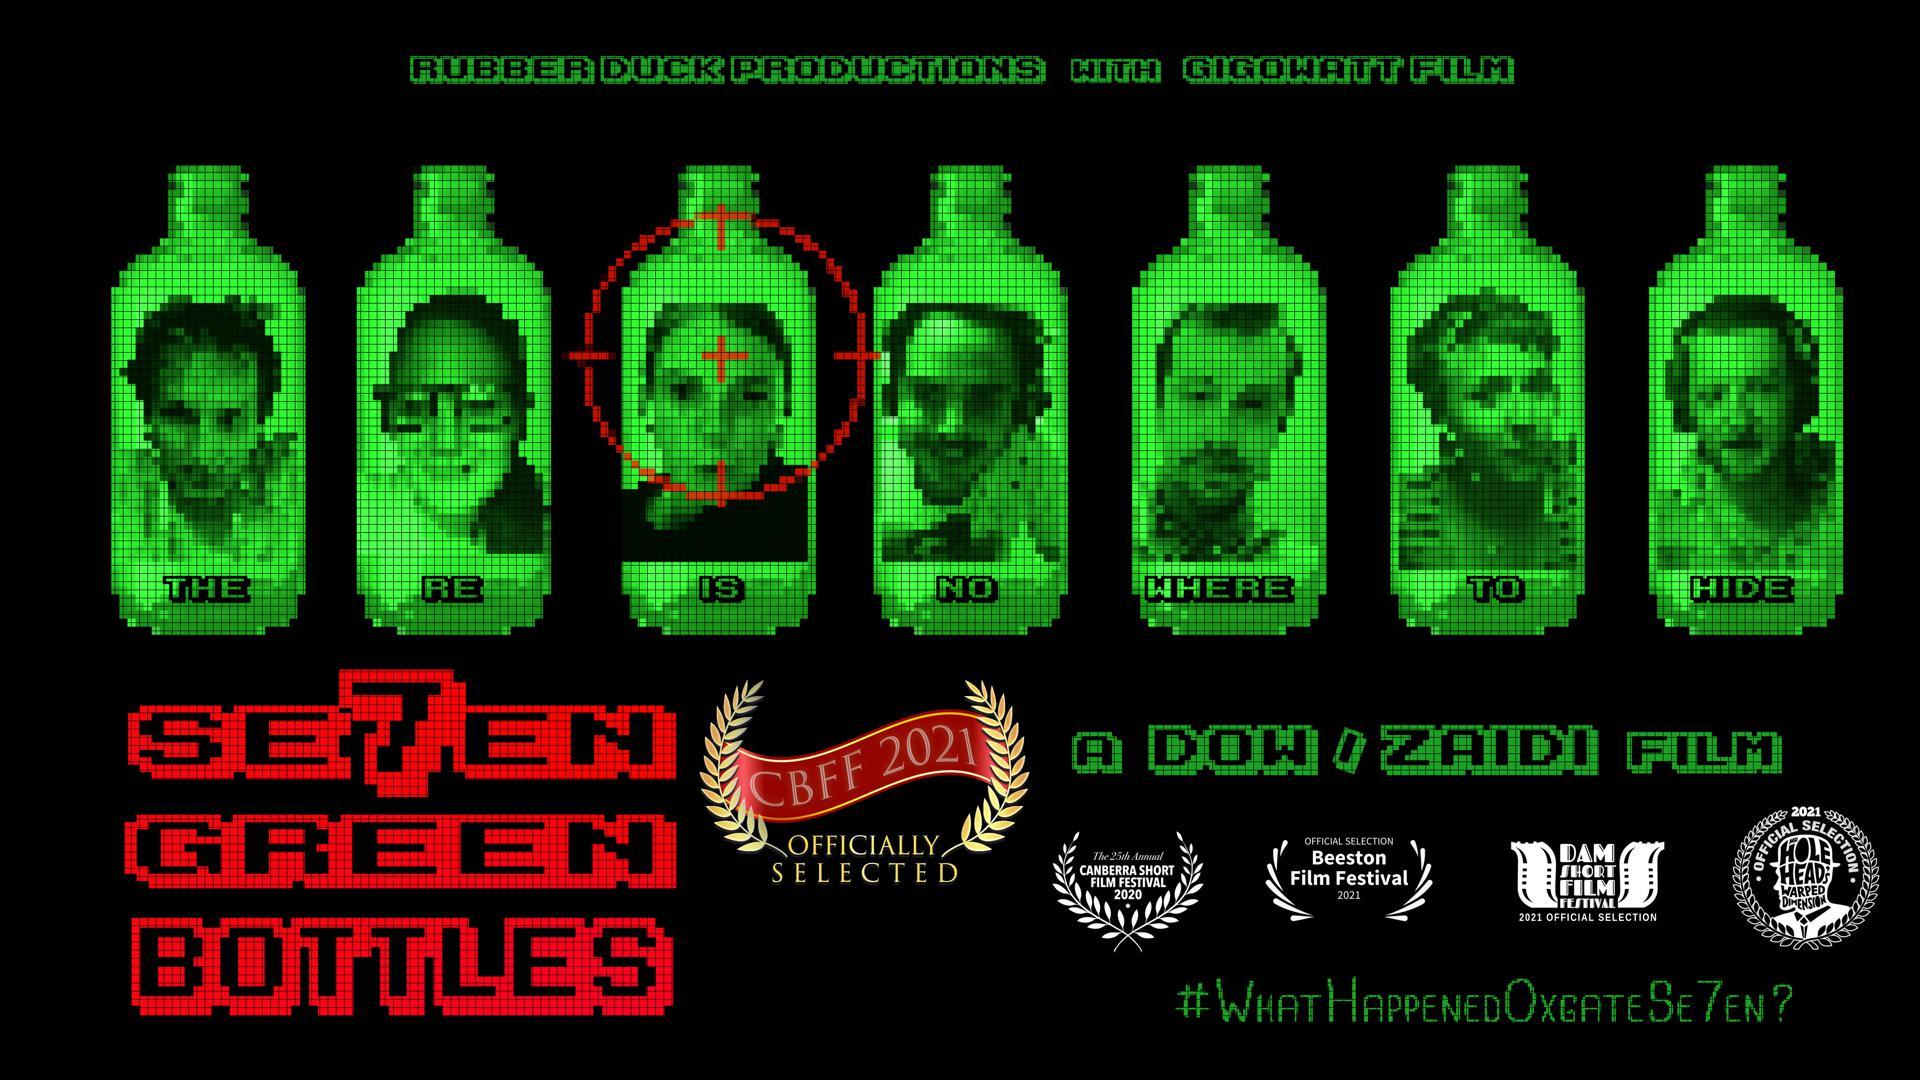 Se7en Green Bottles